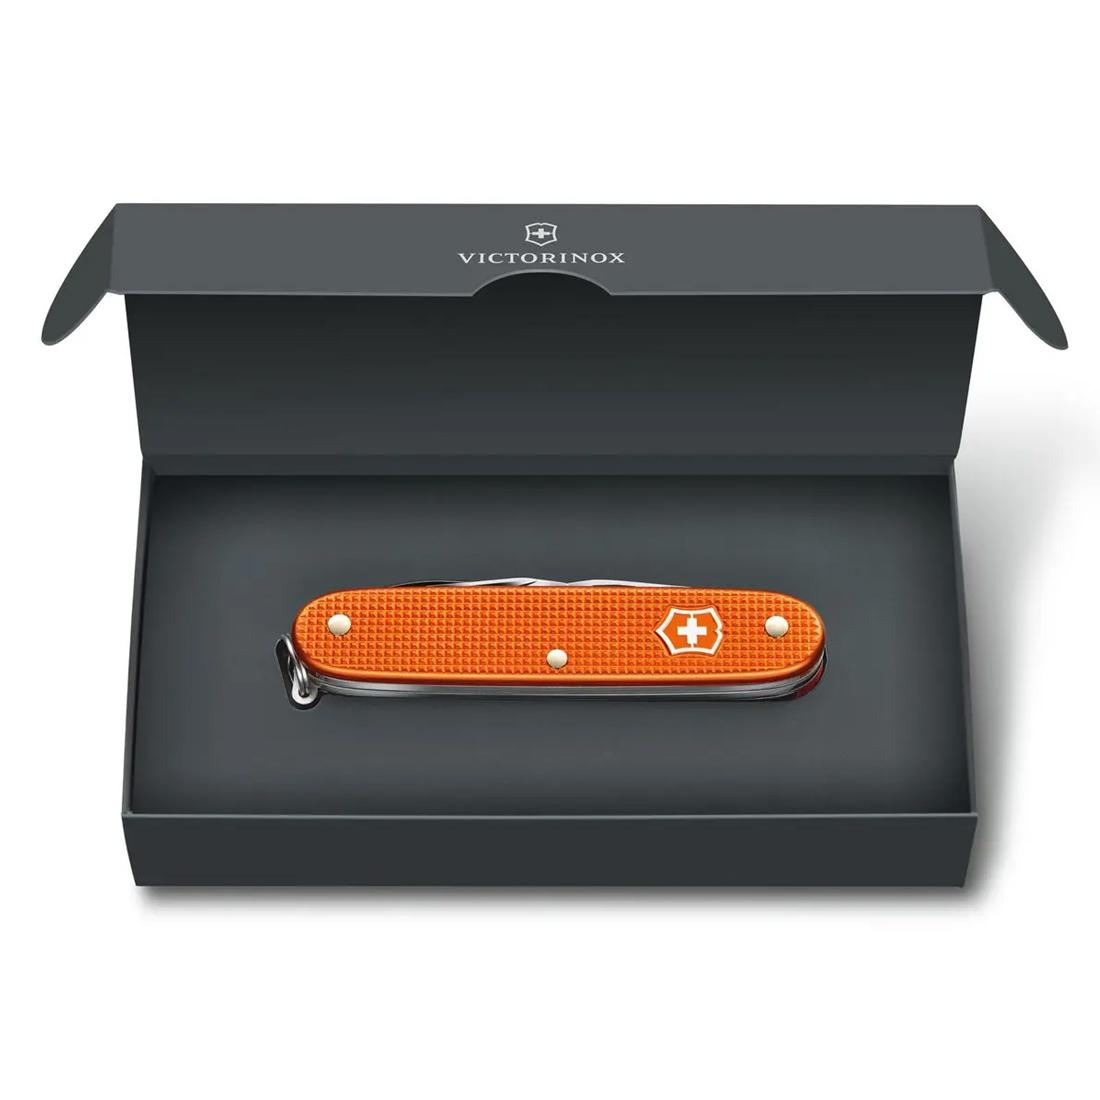 Canivete Victorinox Pioneer X Alox Laranja Edição Limitada 2021 0.8231.L21